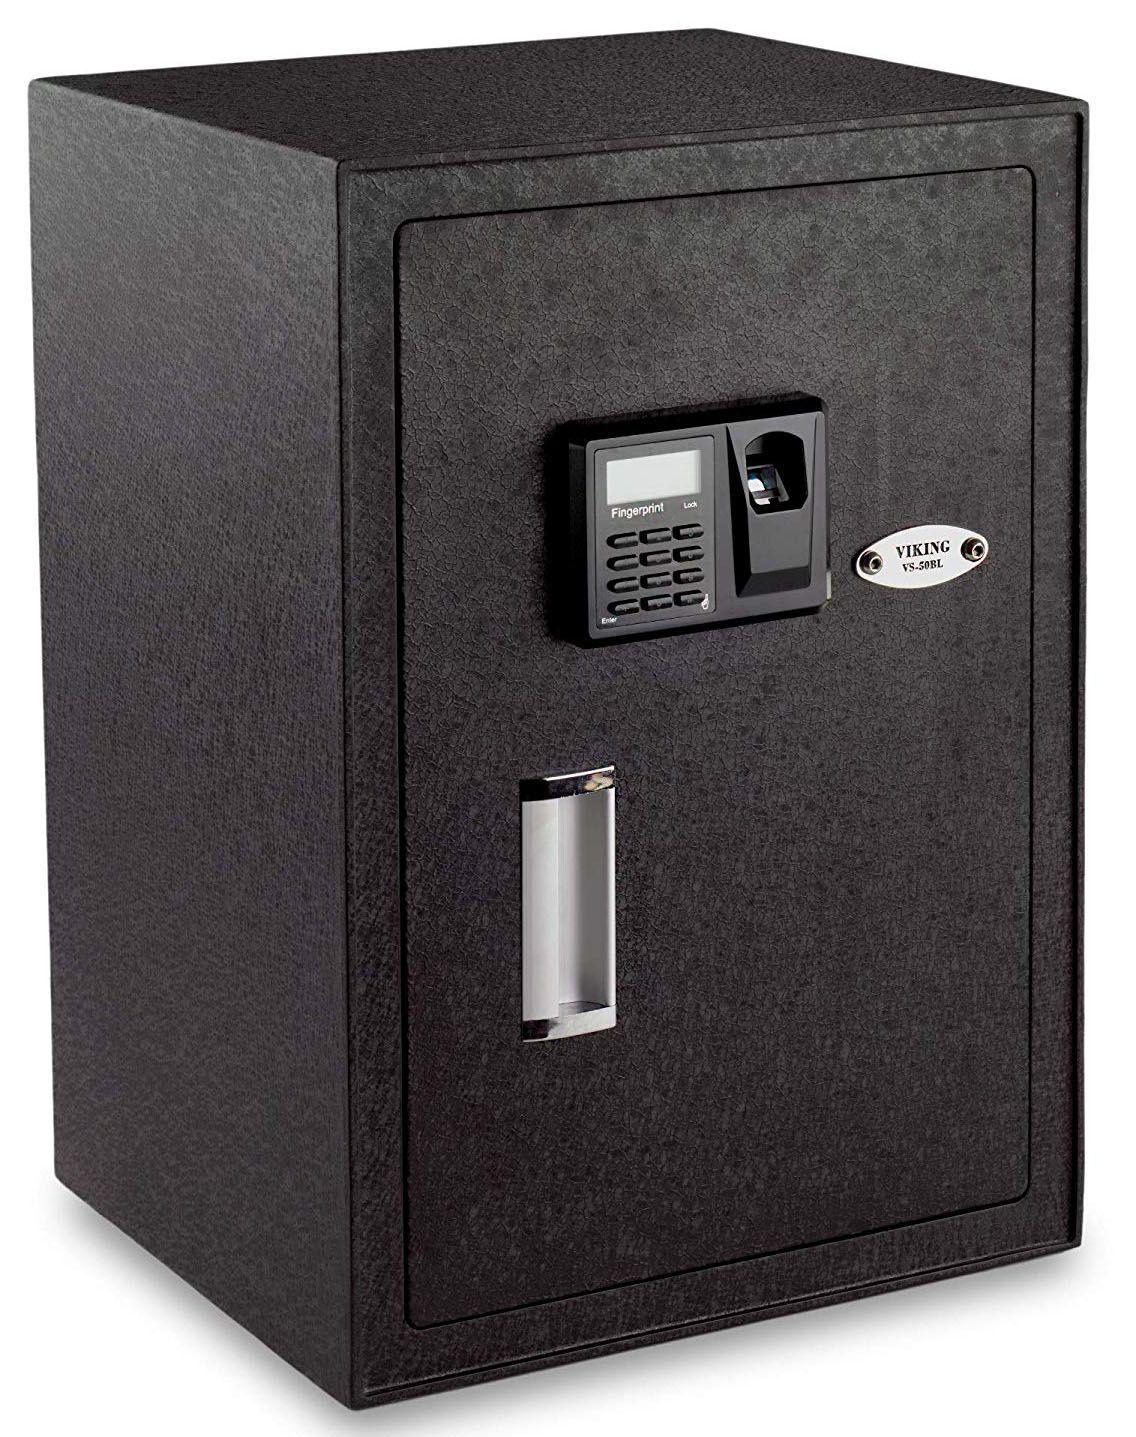 Large Bio metric safe Made of steel Upgraded 500 DPI